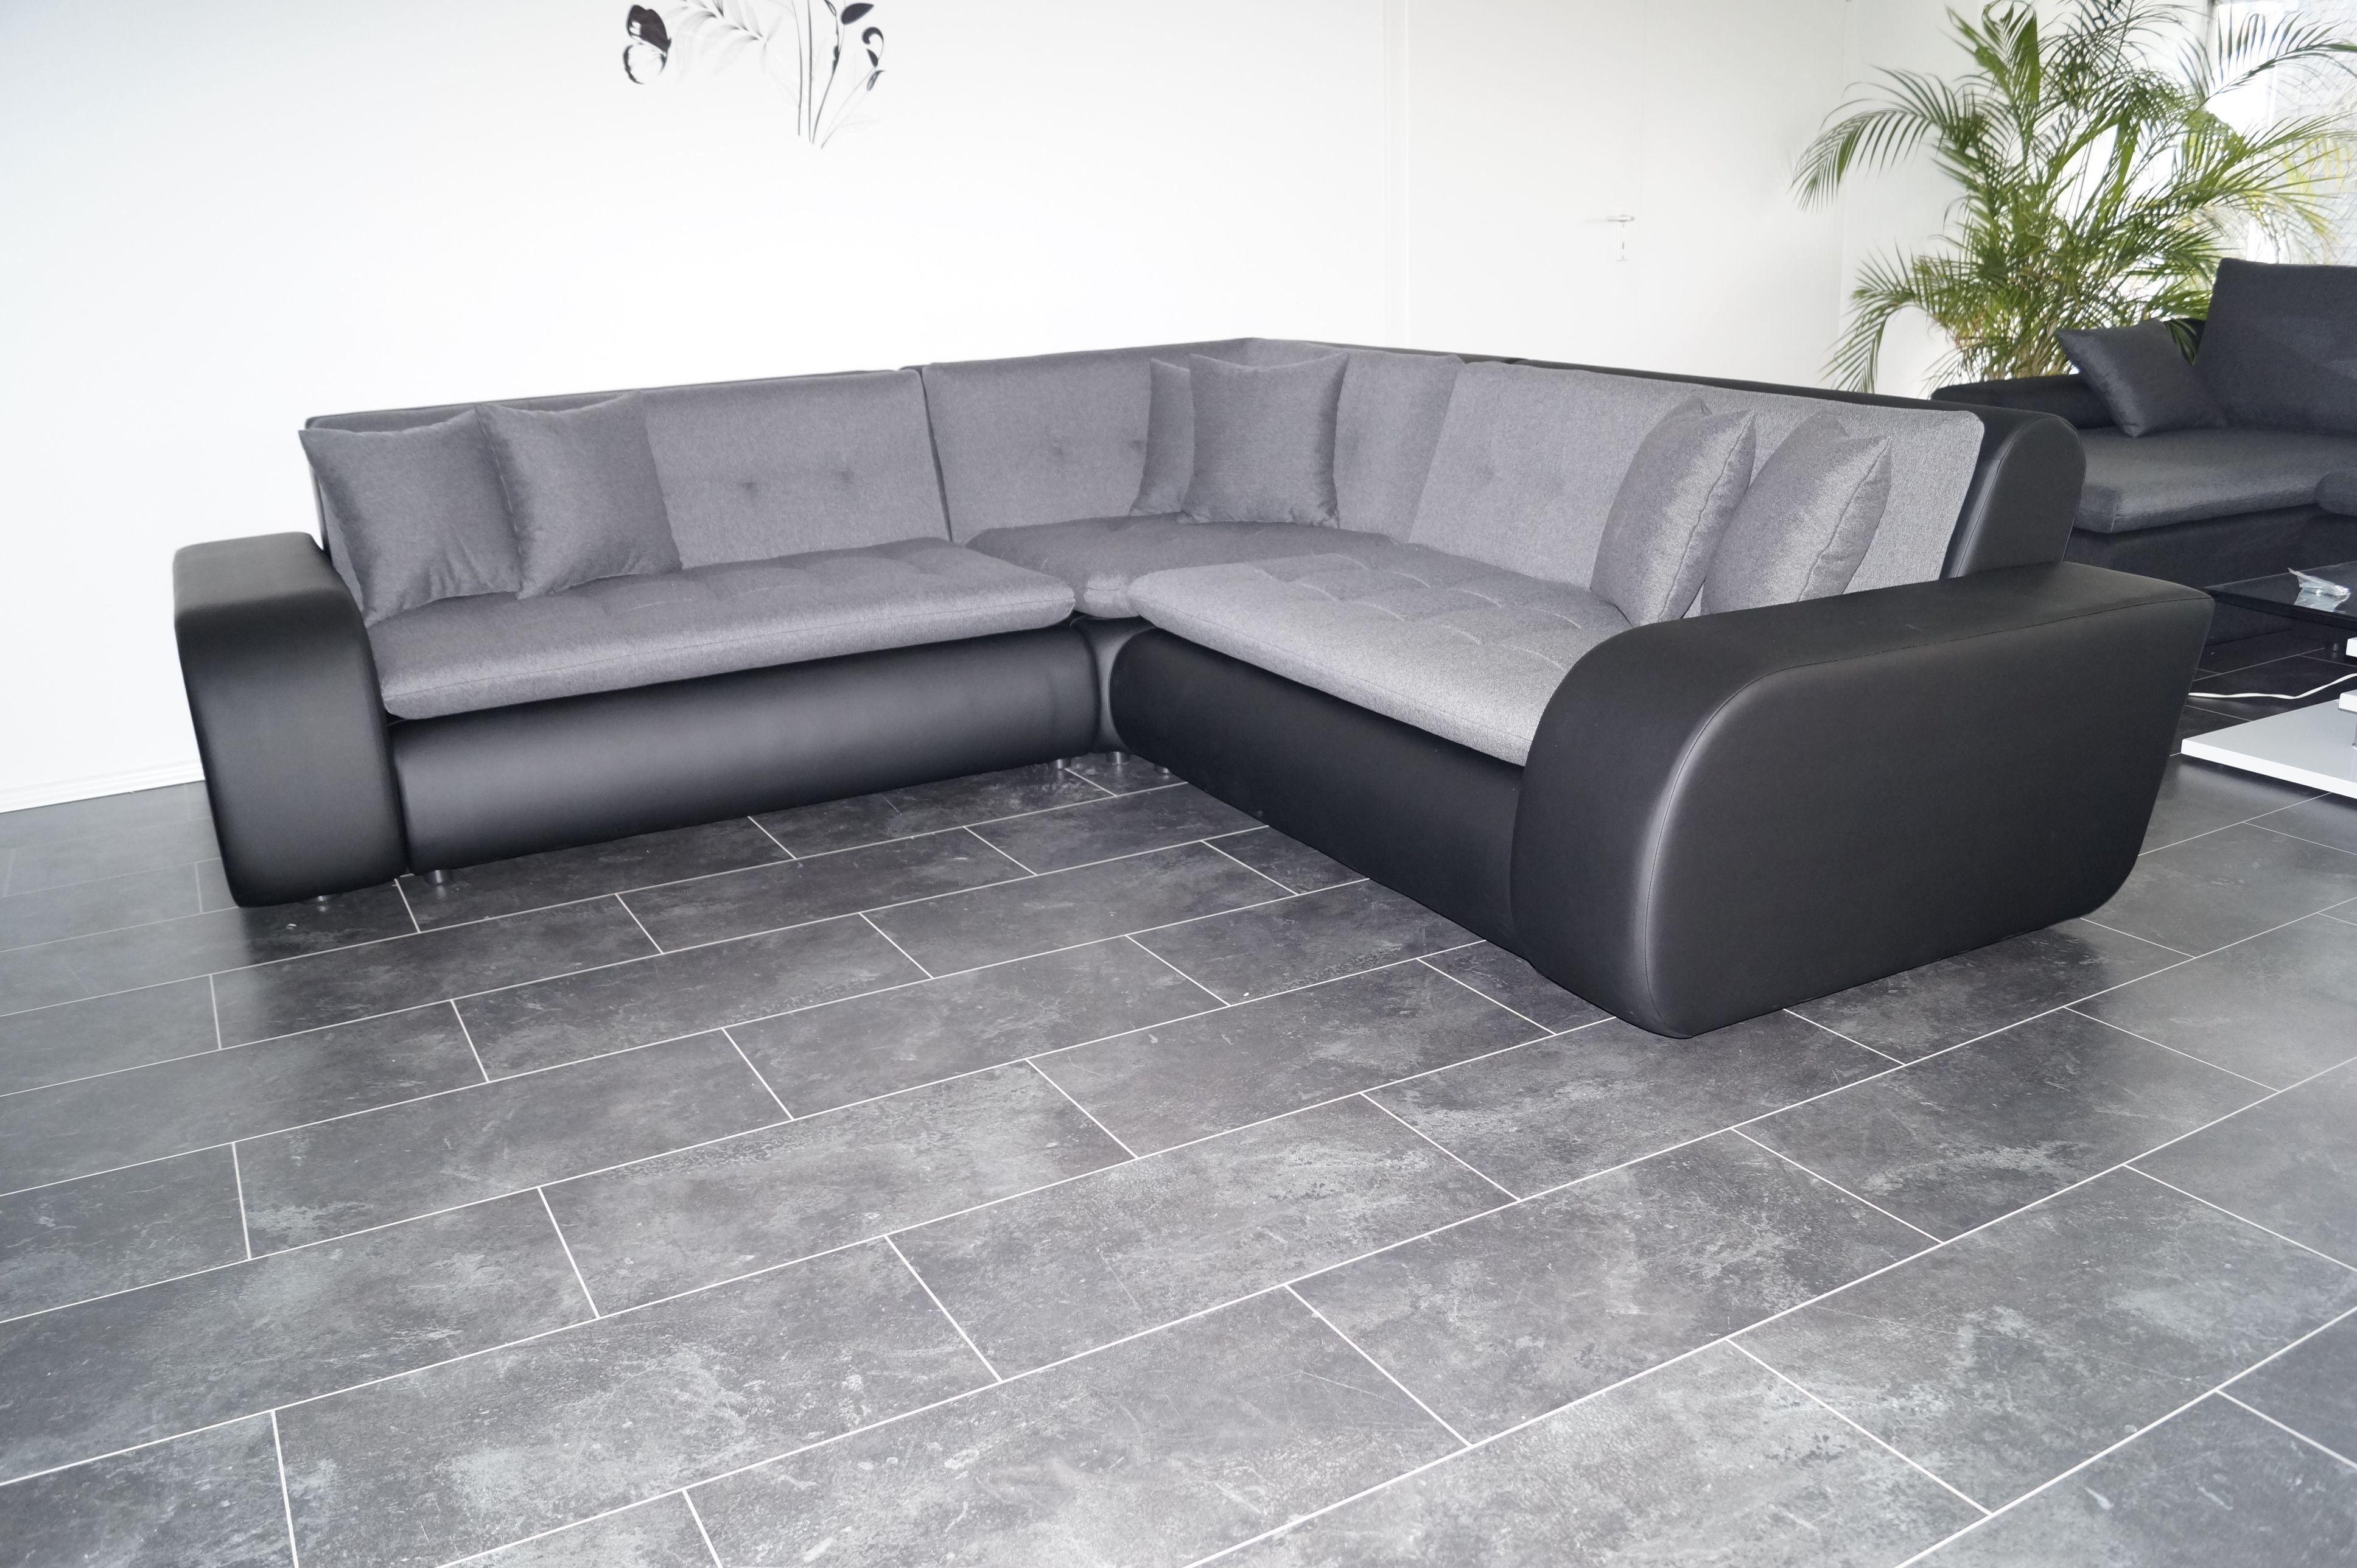 lagerverkauf Sofa lagerverkauf Sofa Couch Sofa